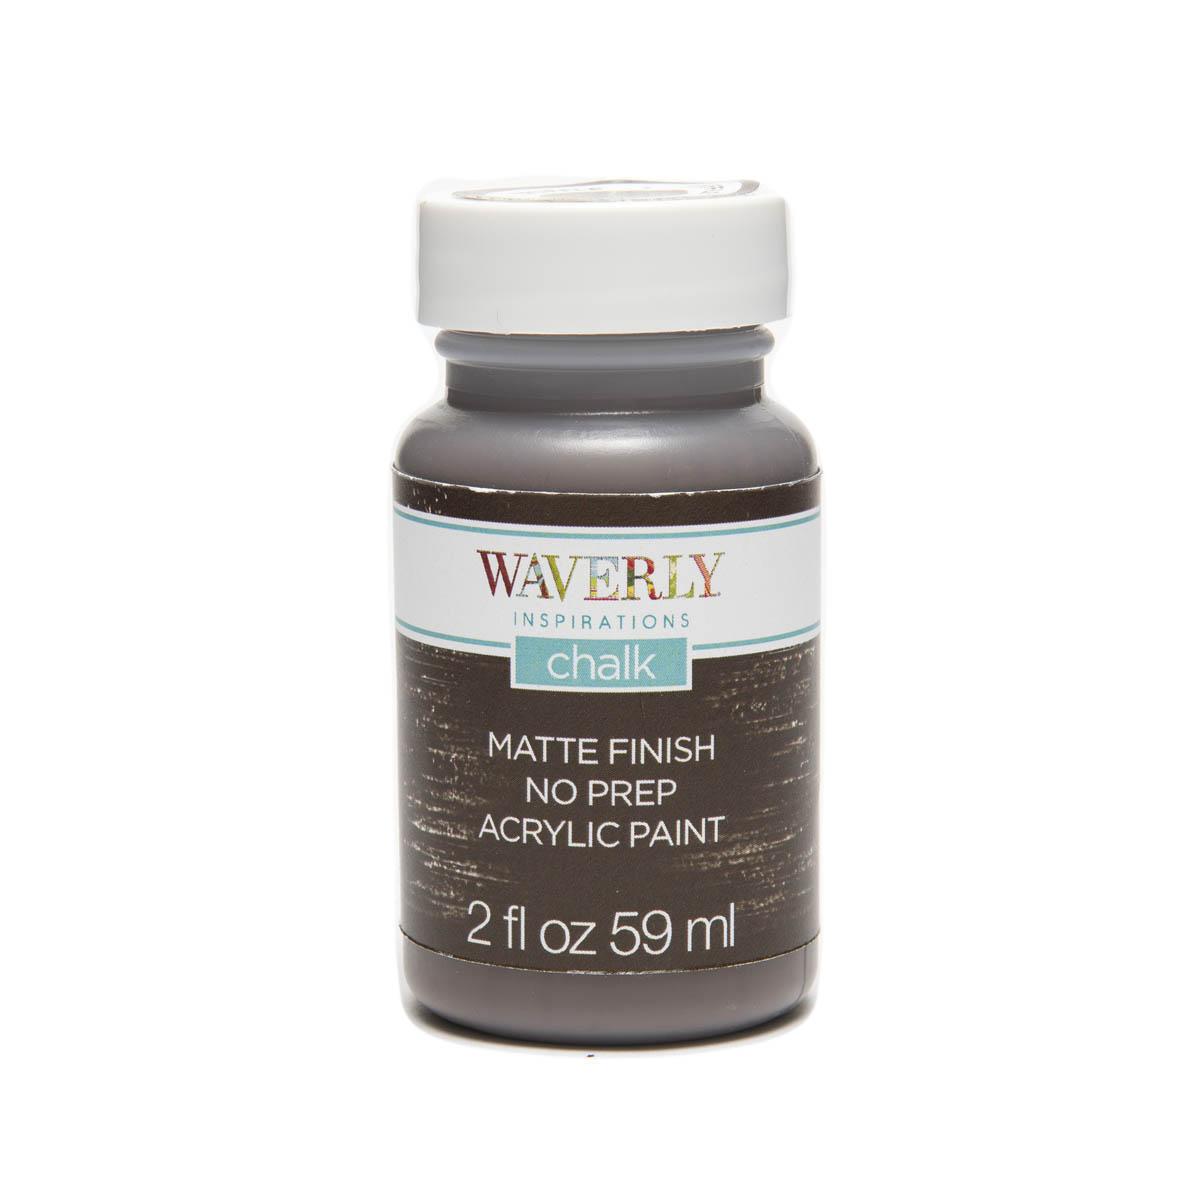 Waverly ® Inspirations Chalk Finish Acrylic Paint - Truffle, 2 oz.